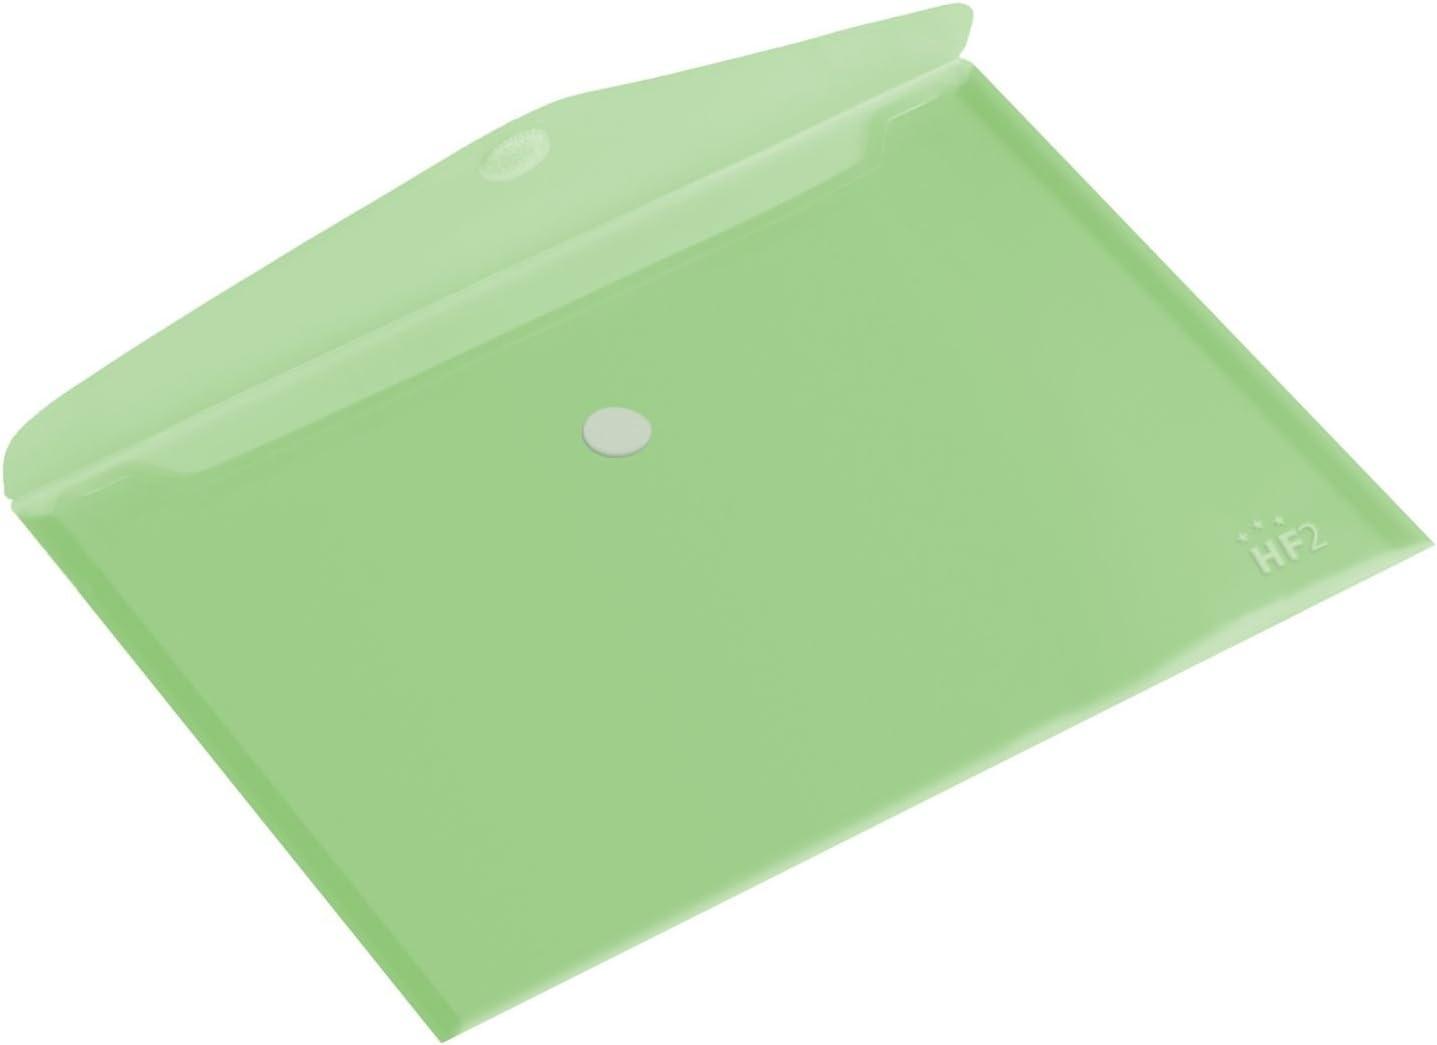 HF2 190436-Carpetas sobres A5 (Pack de 10) en PP translúcido para documentos, con cierre de velcro, diseño horizontal - Verde